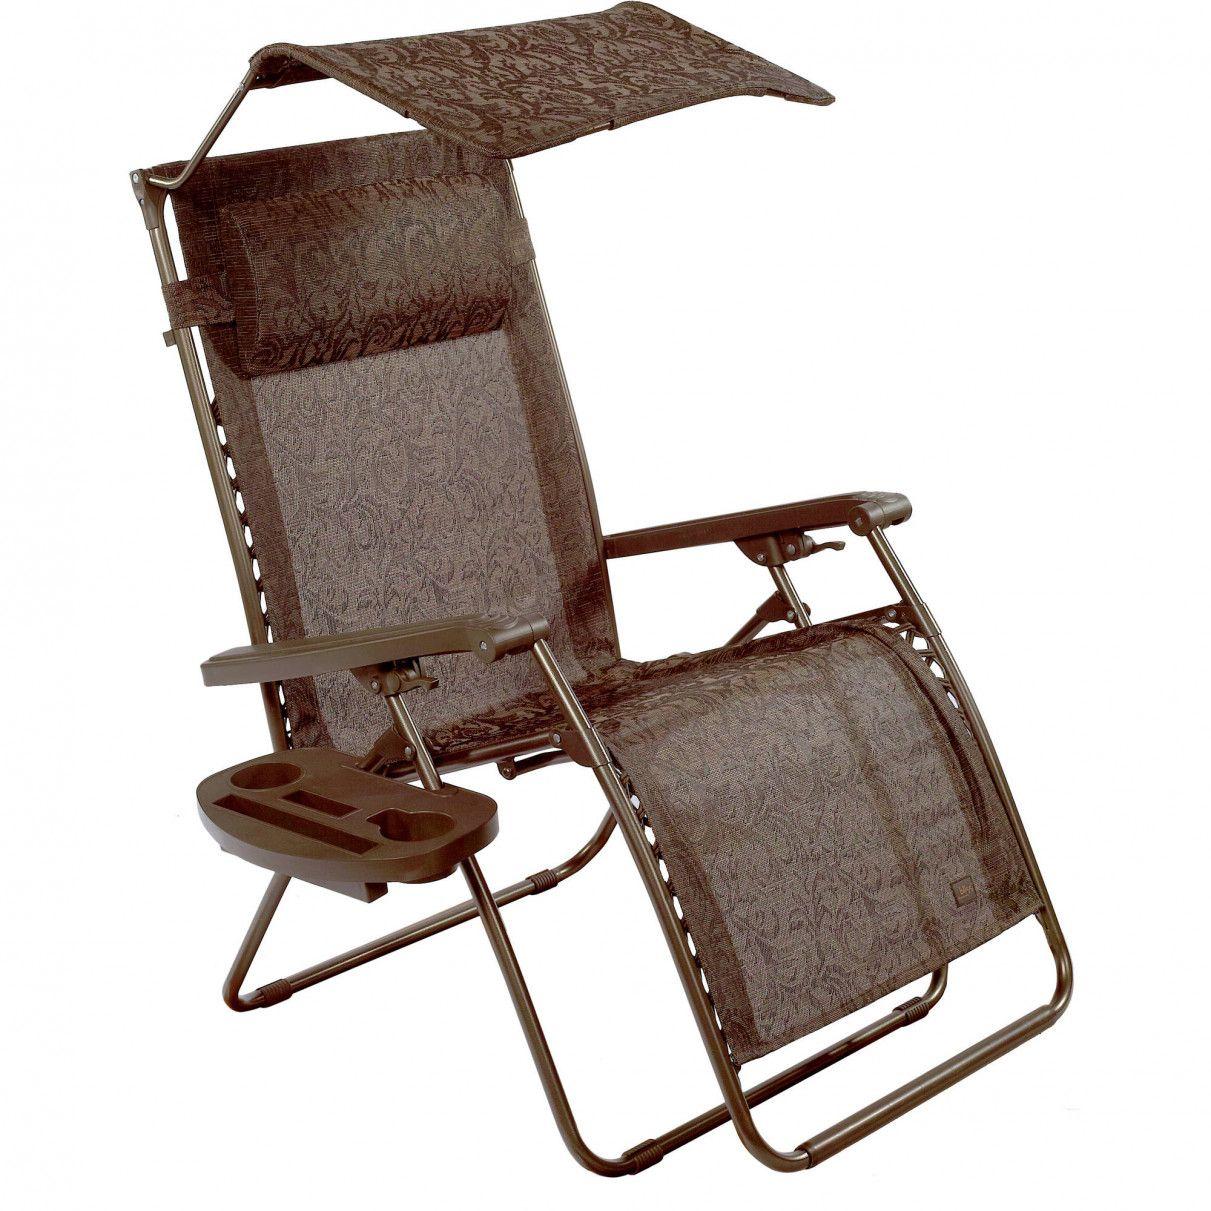 Bliss hammocks zero gravity chair home office furniture ideas